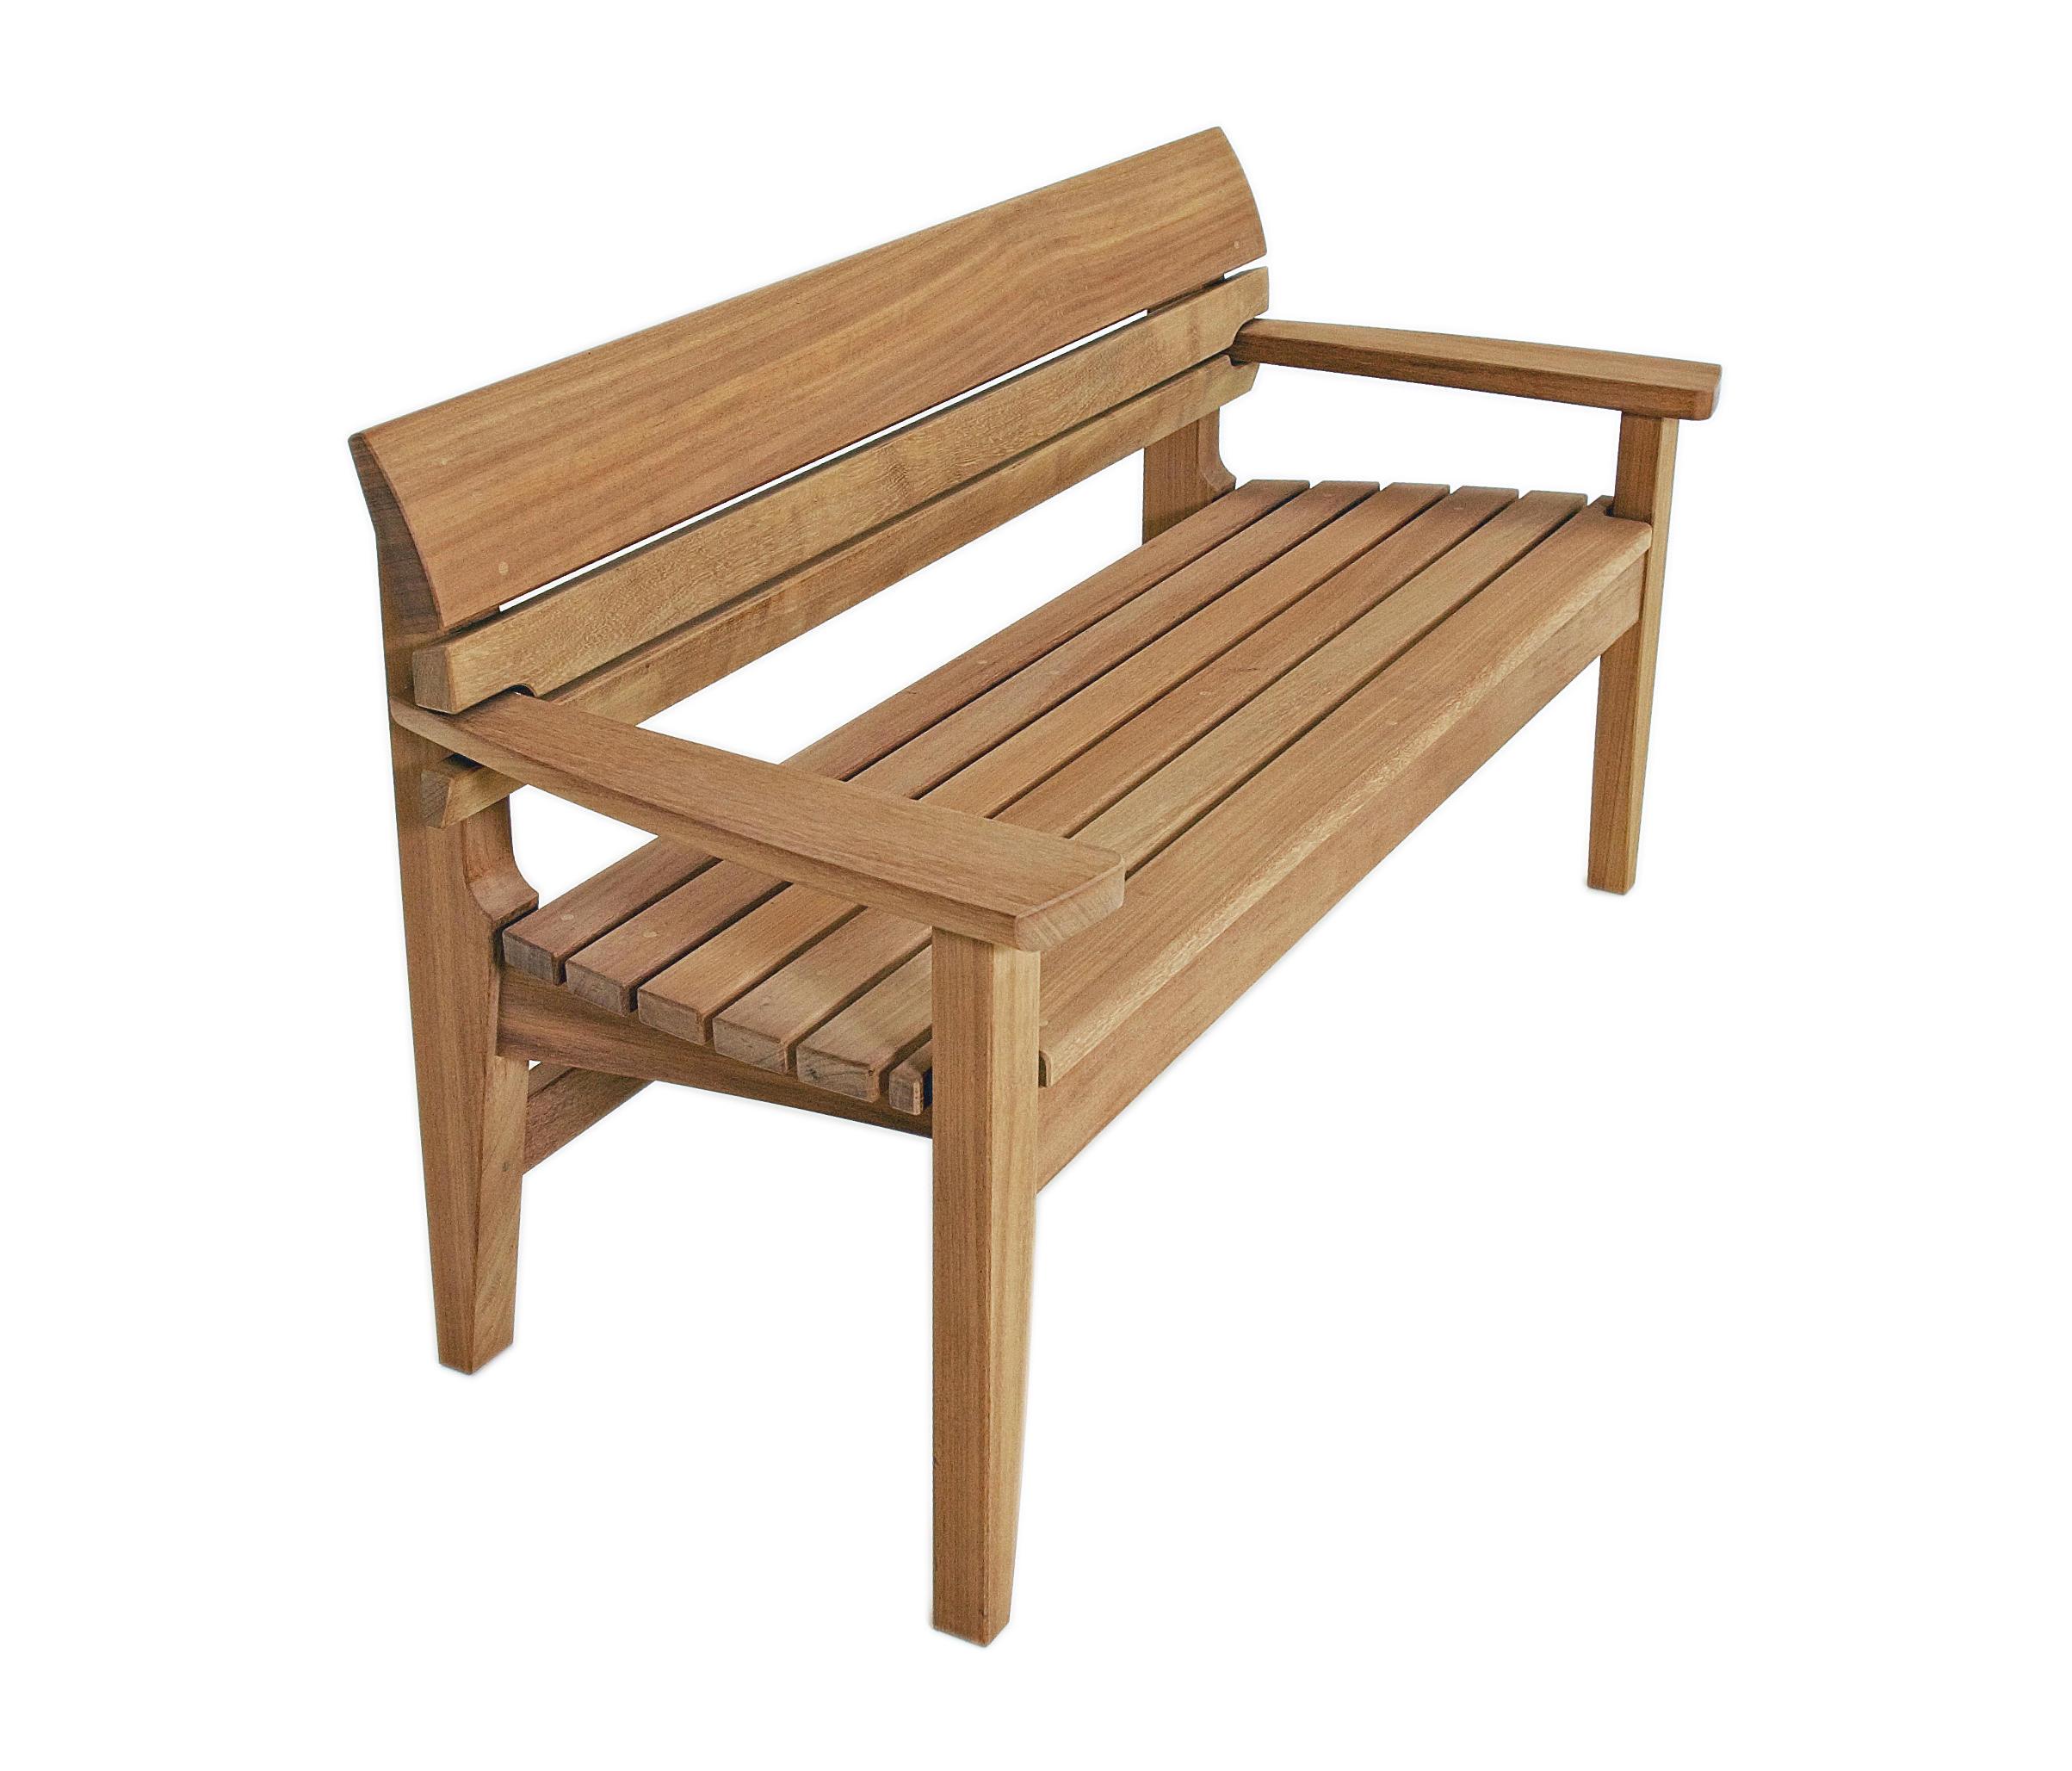 Chico Full Bench Muebles De Diseno Architonic